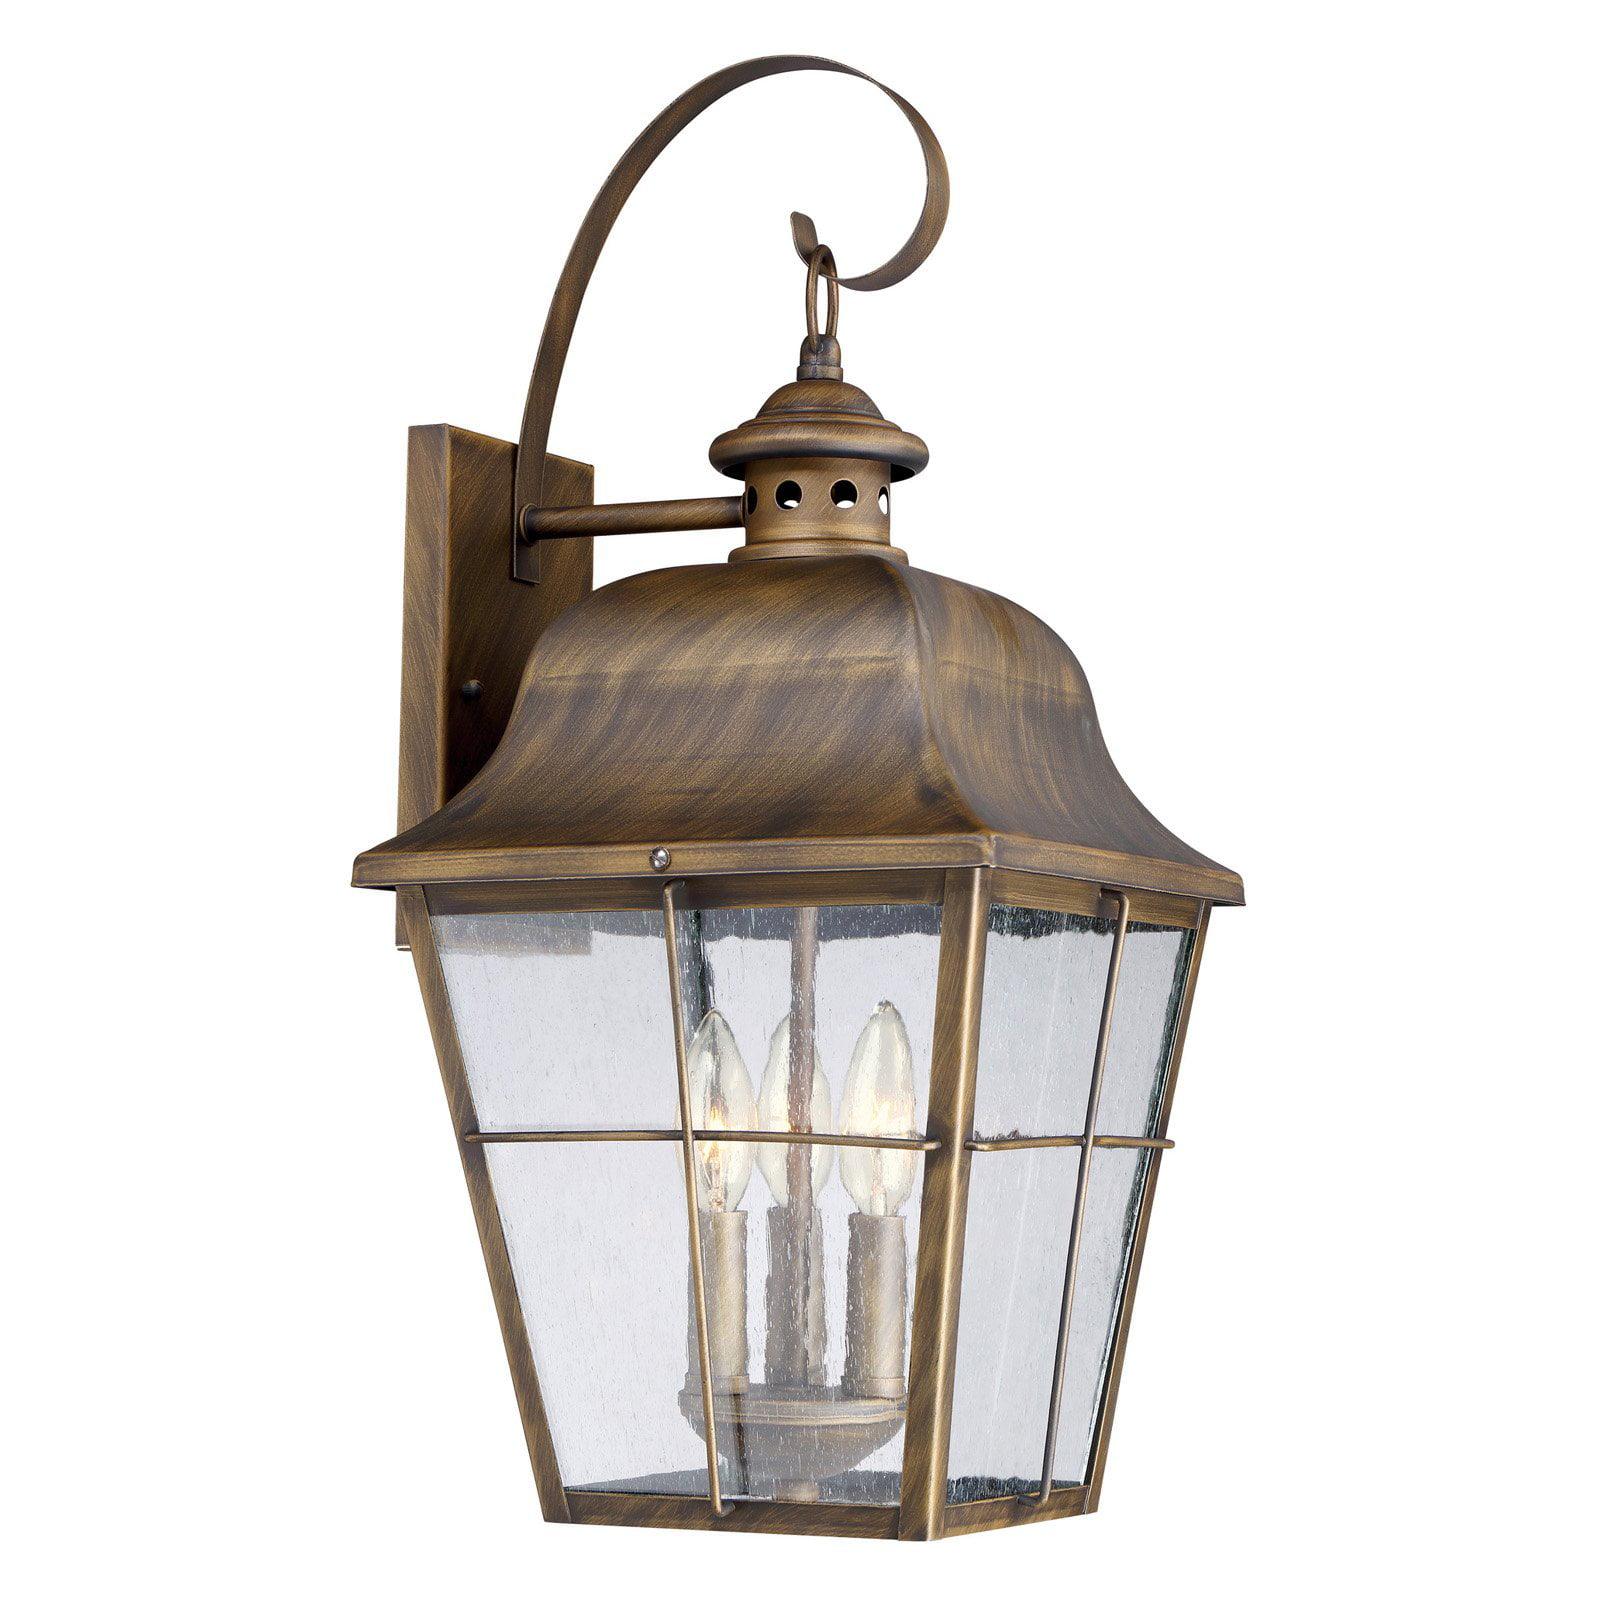 Quoizel Millhouse MHE8410K Outdoor Wall Lantern